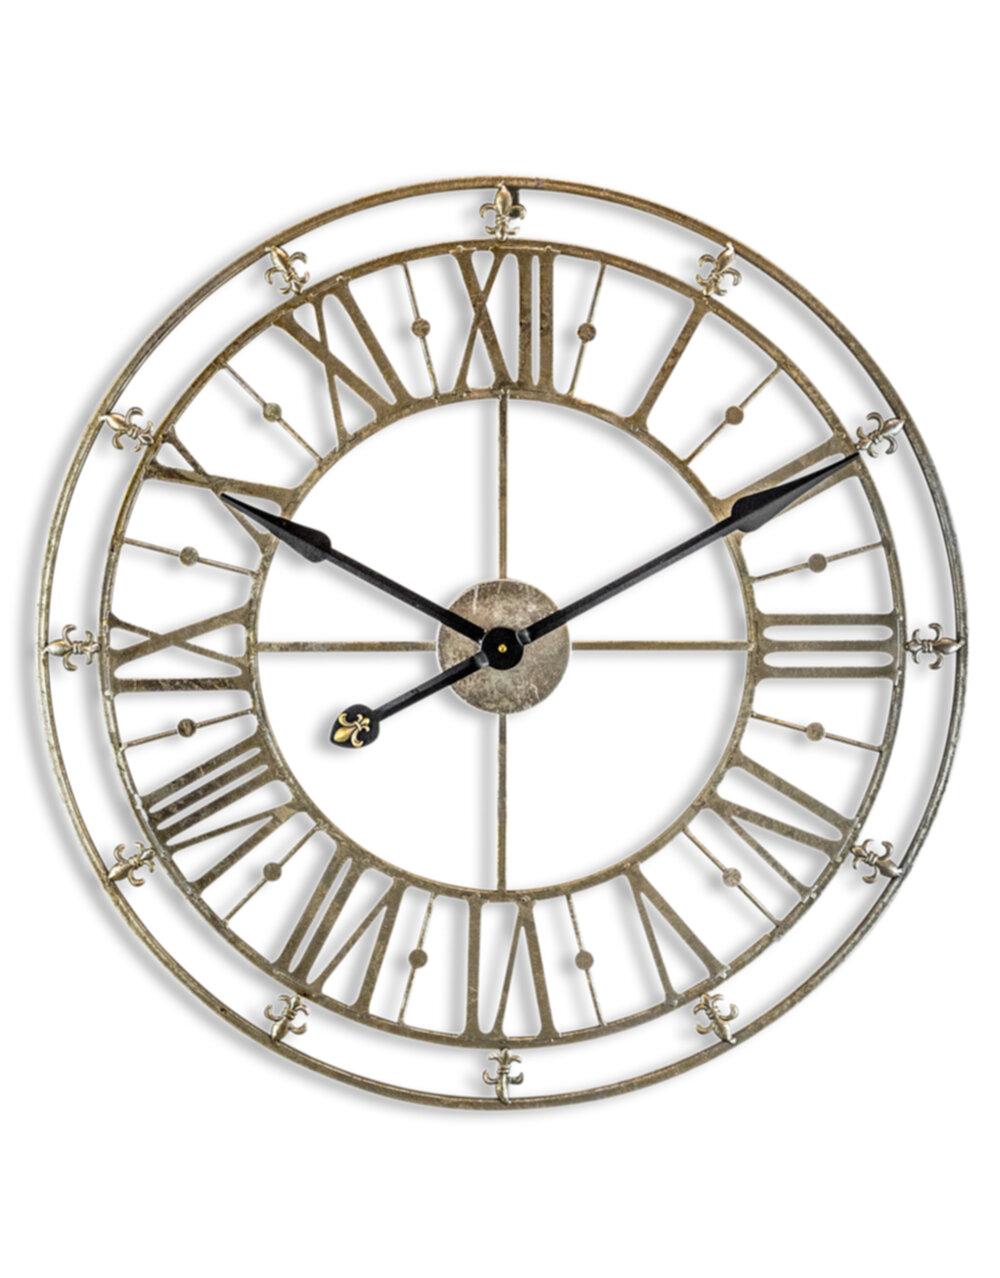 Medium Champagne/Silver Iron Skeleton Wall Clock